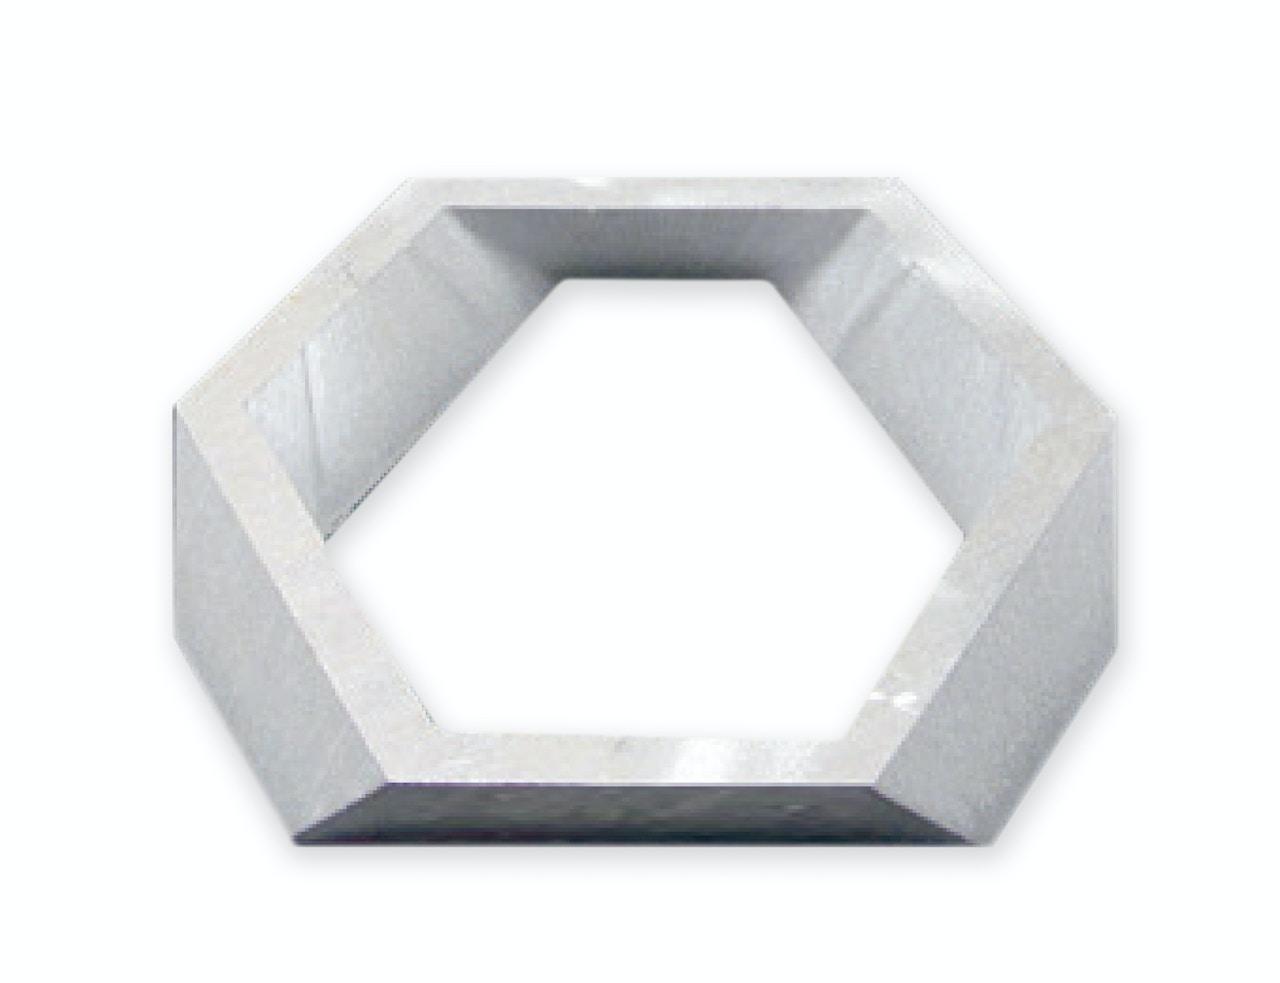 Custom components manufacturing - Plastic shim